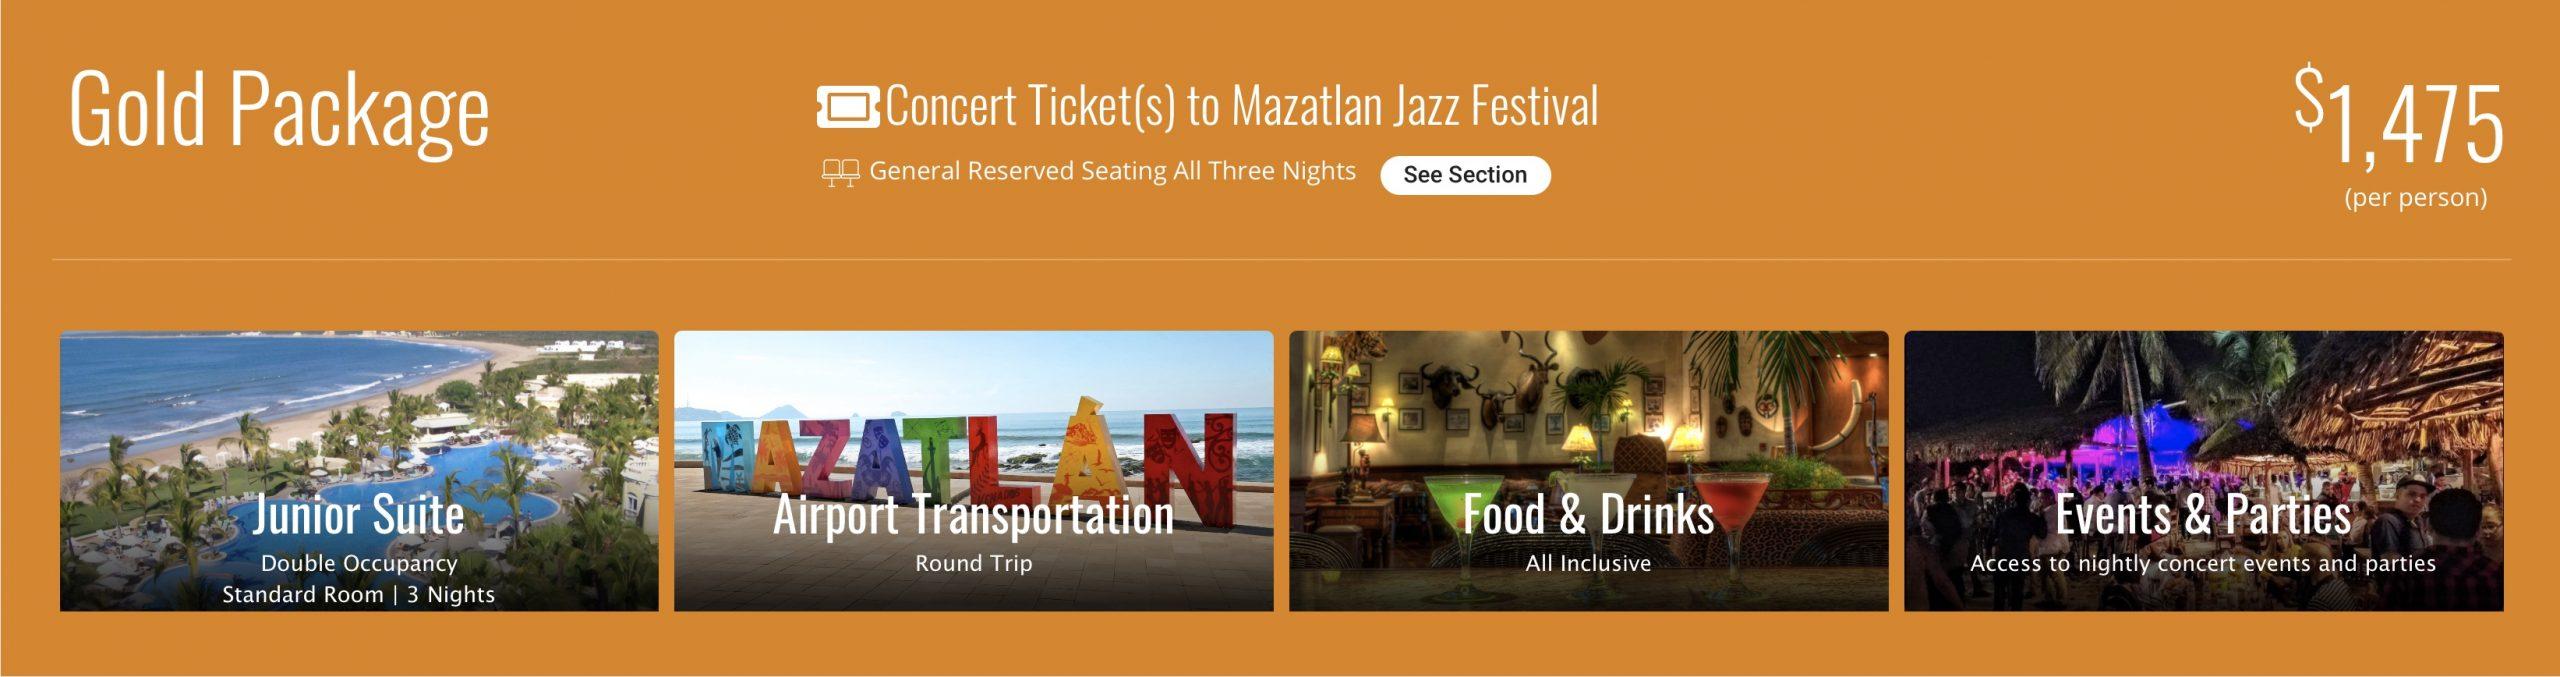 Mazatlan Jazz Festival 2021 Bookings